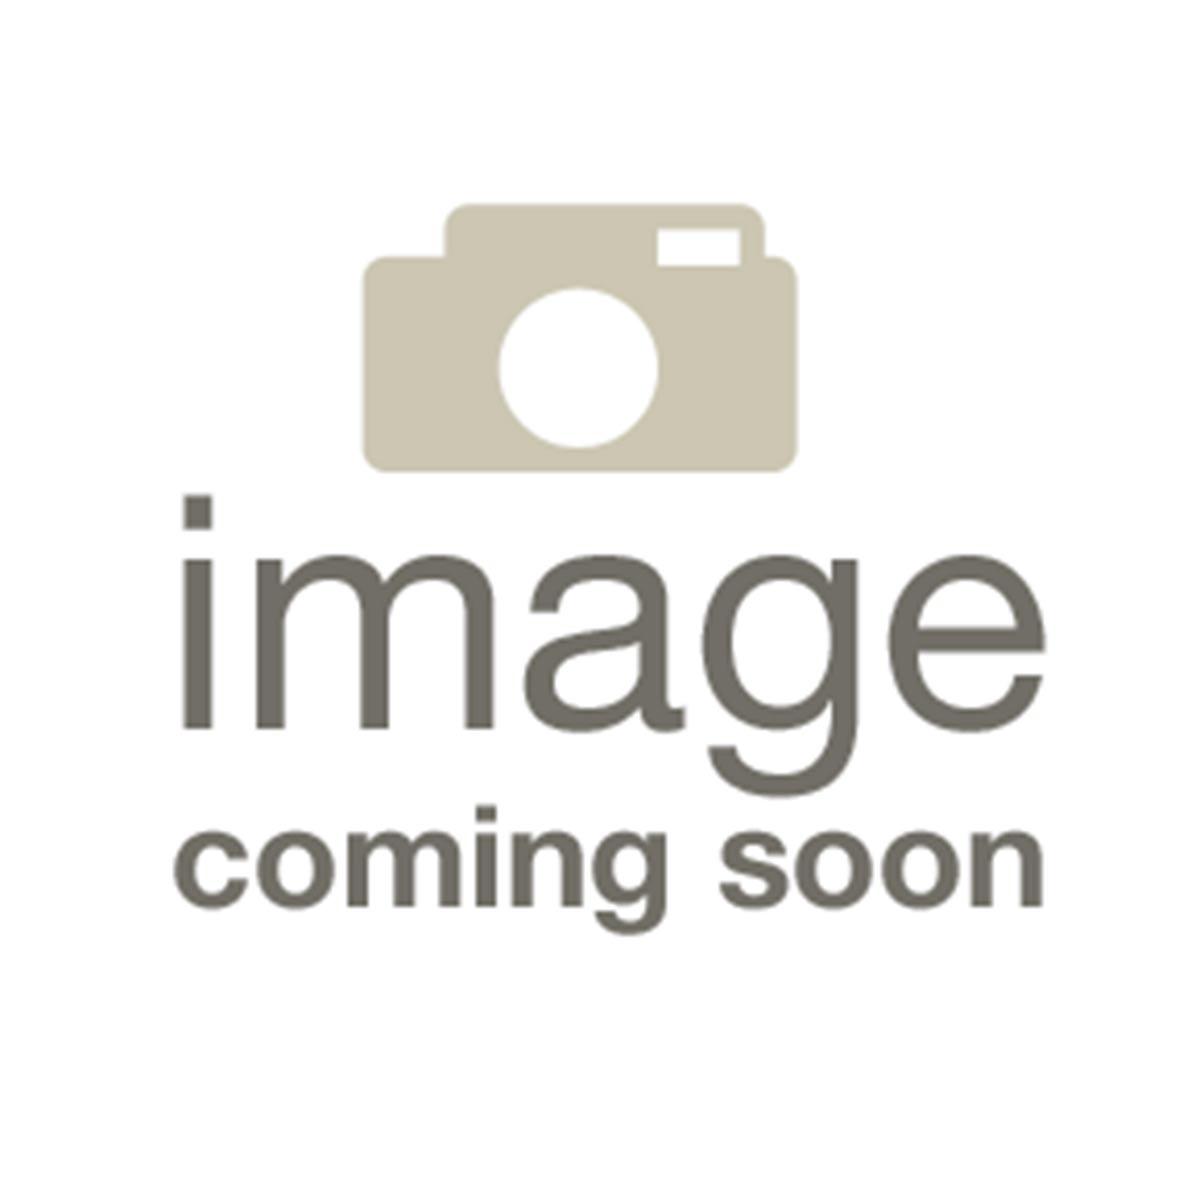 Touch Screen Smart Gloves - Fleece Lined  849-MT Spiral Yarn Mint - One Size